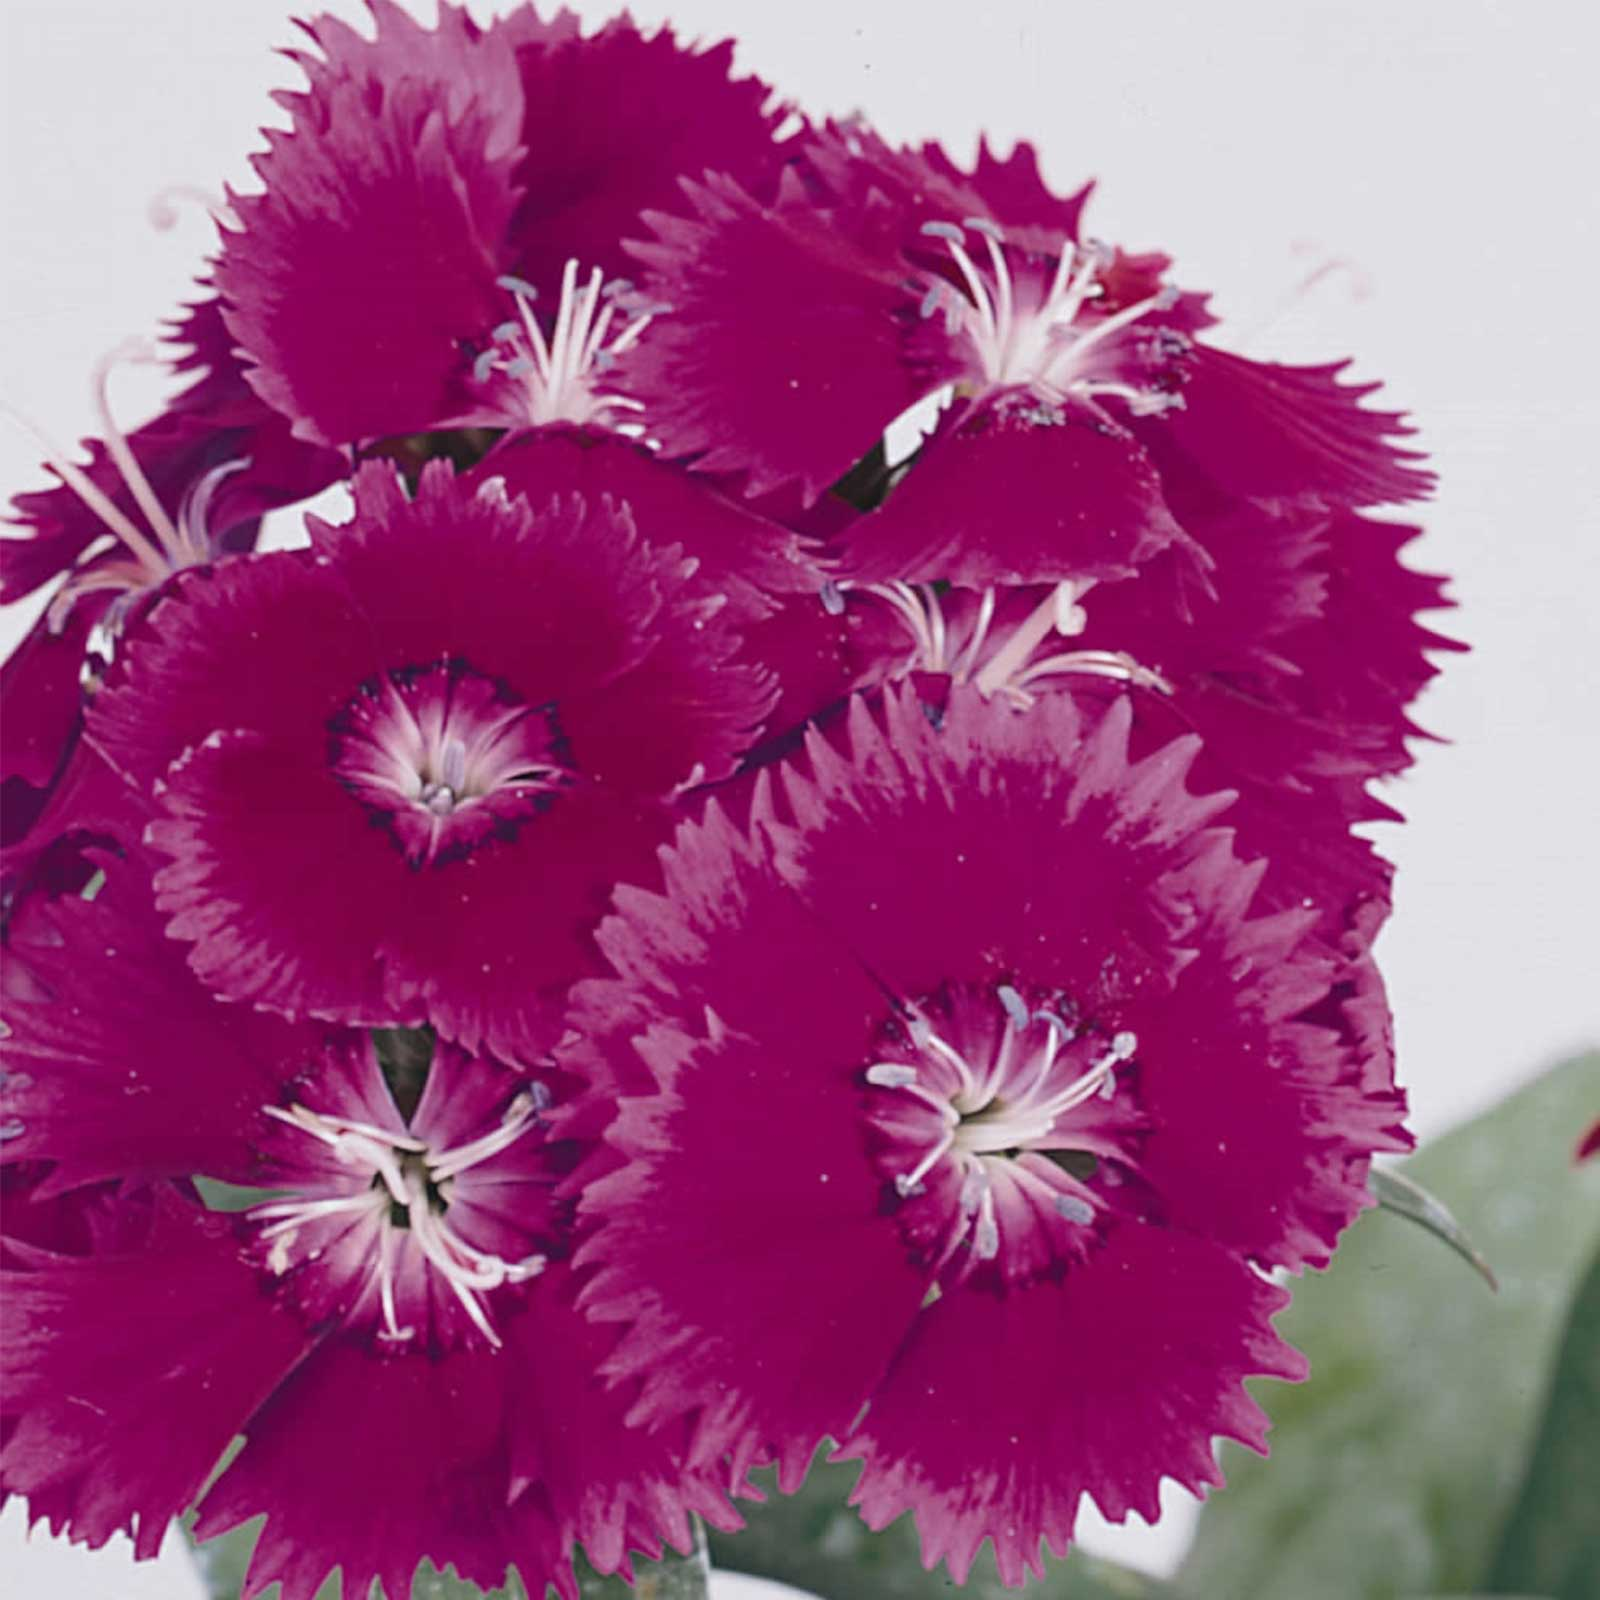 Dianthus Floral Lace Series Flower Seeds - Purple - 500 Seeds - Annual Flower Garden Seeds - Dianthus chinensis x barbatus